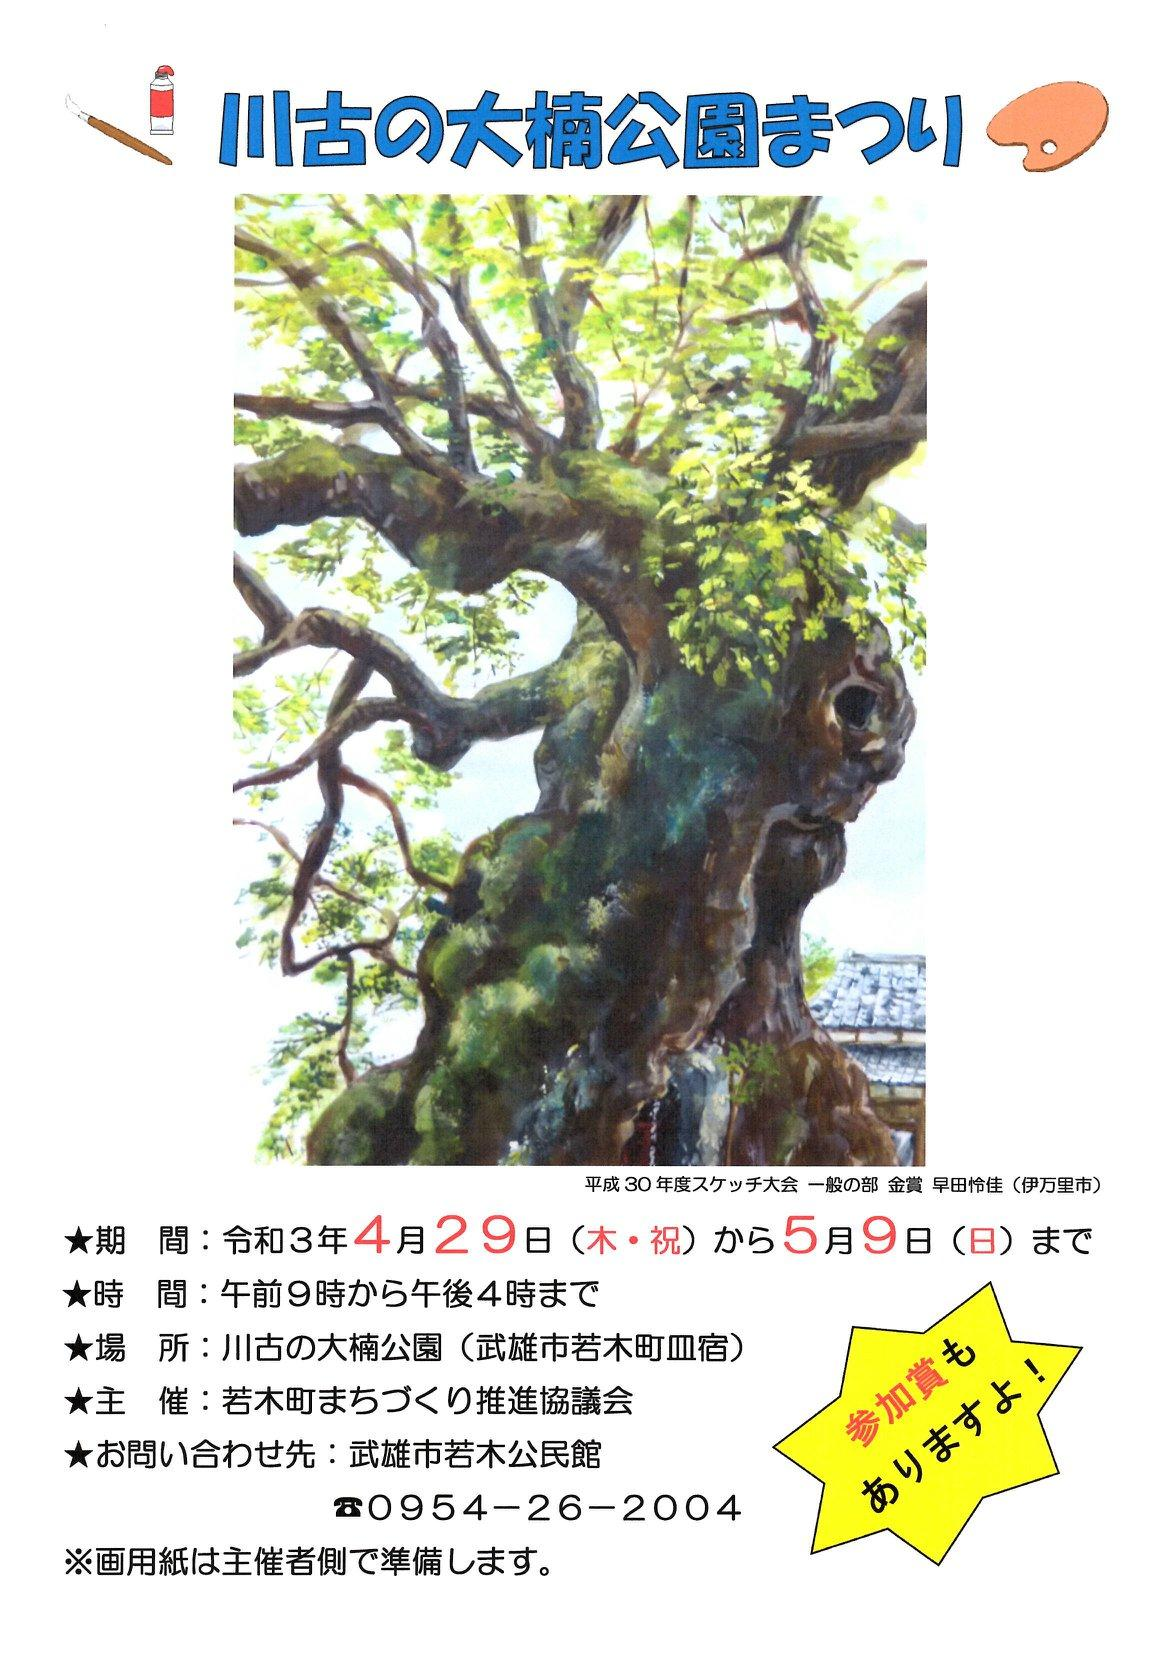 http://www.takeo-kk.net/event/uploads/175171419_6913222572037088_4527241080486708324_n.jpg